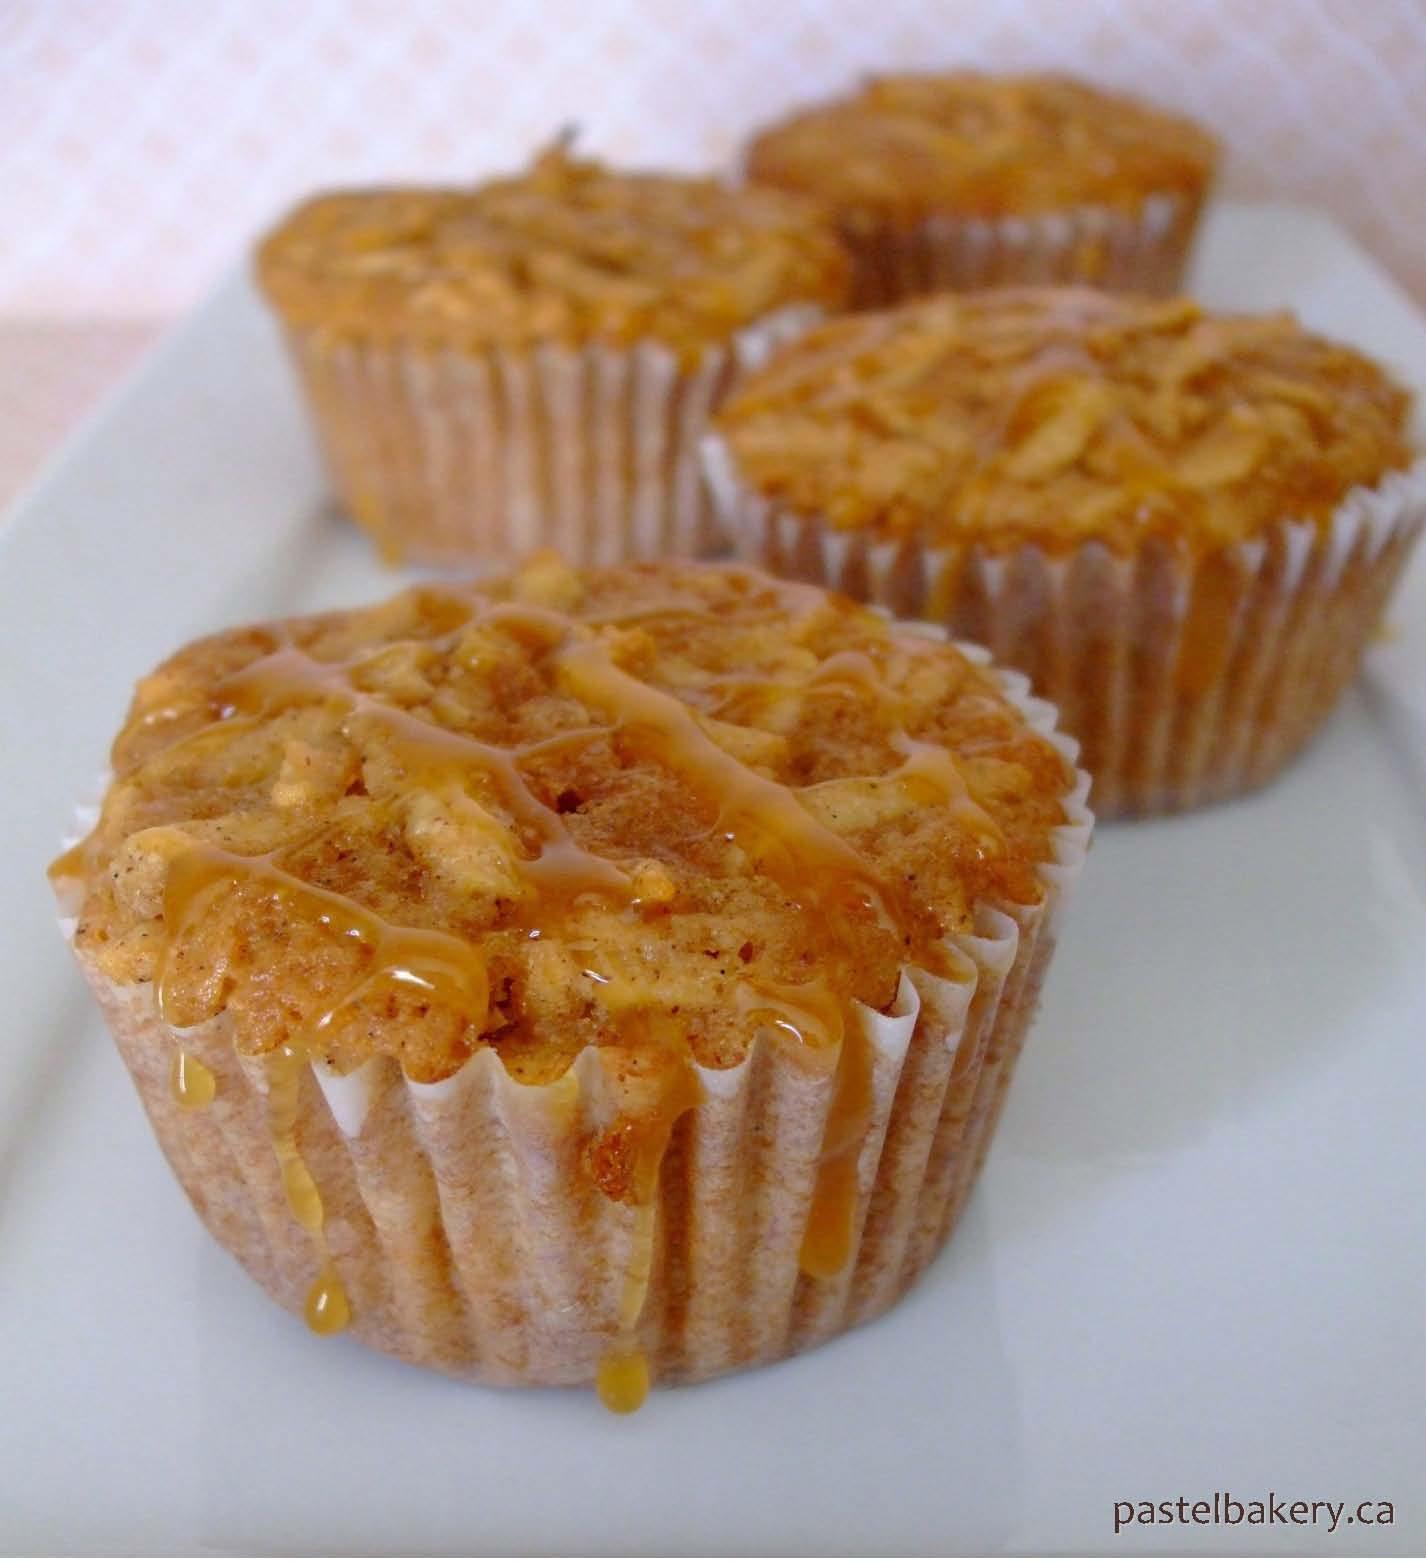 Gluten Free Dairy Free Caramel Apple Spice Muffins | Pastel Bakery